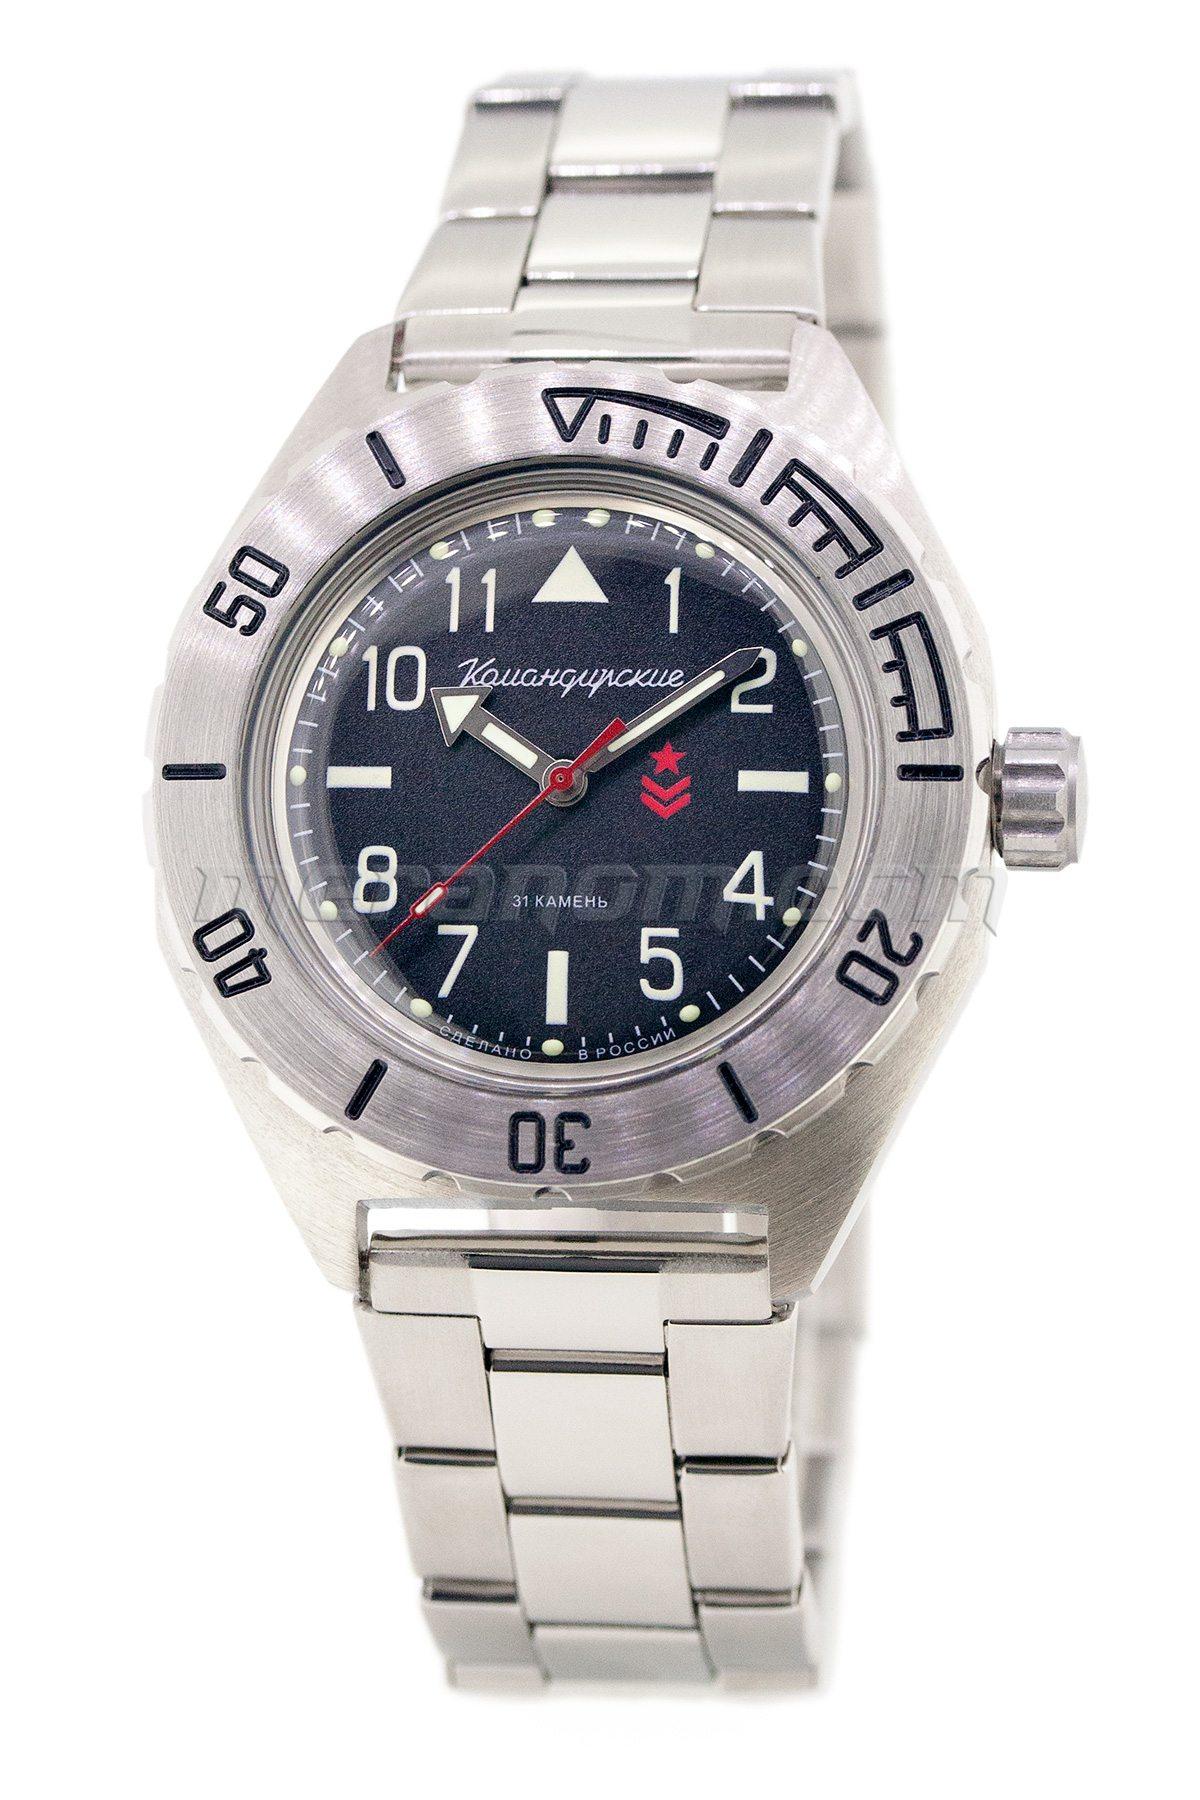 Vostok watch komandirskie 650540 buy from an authorized dealer for Komandirskie watches